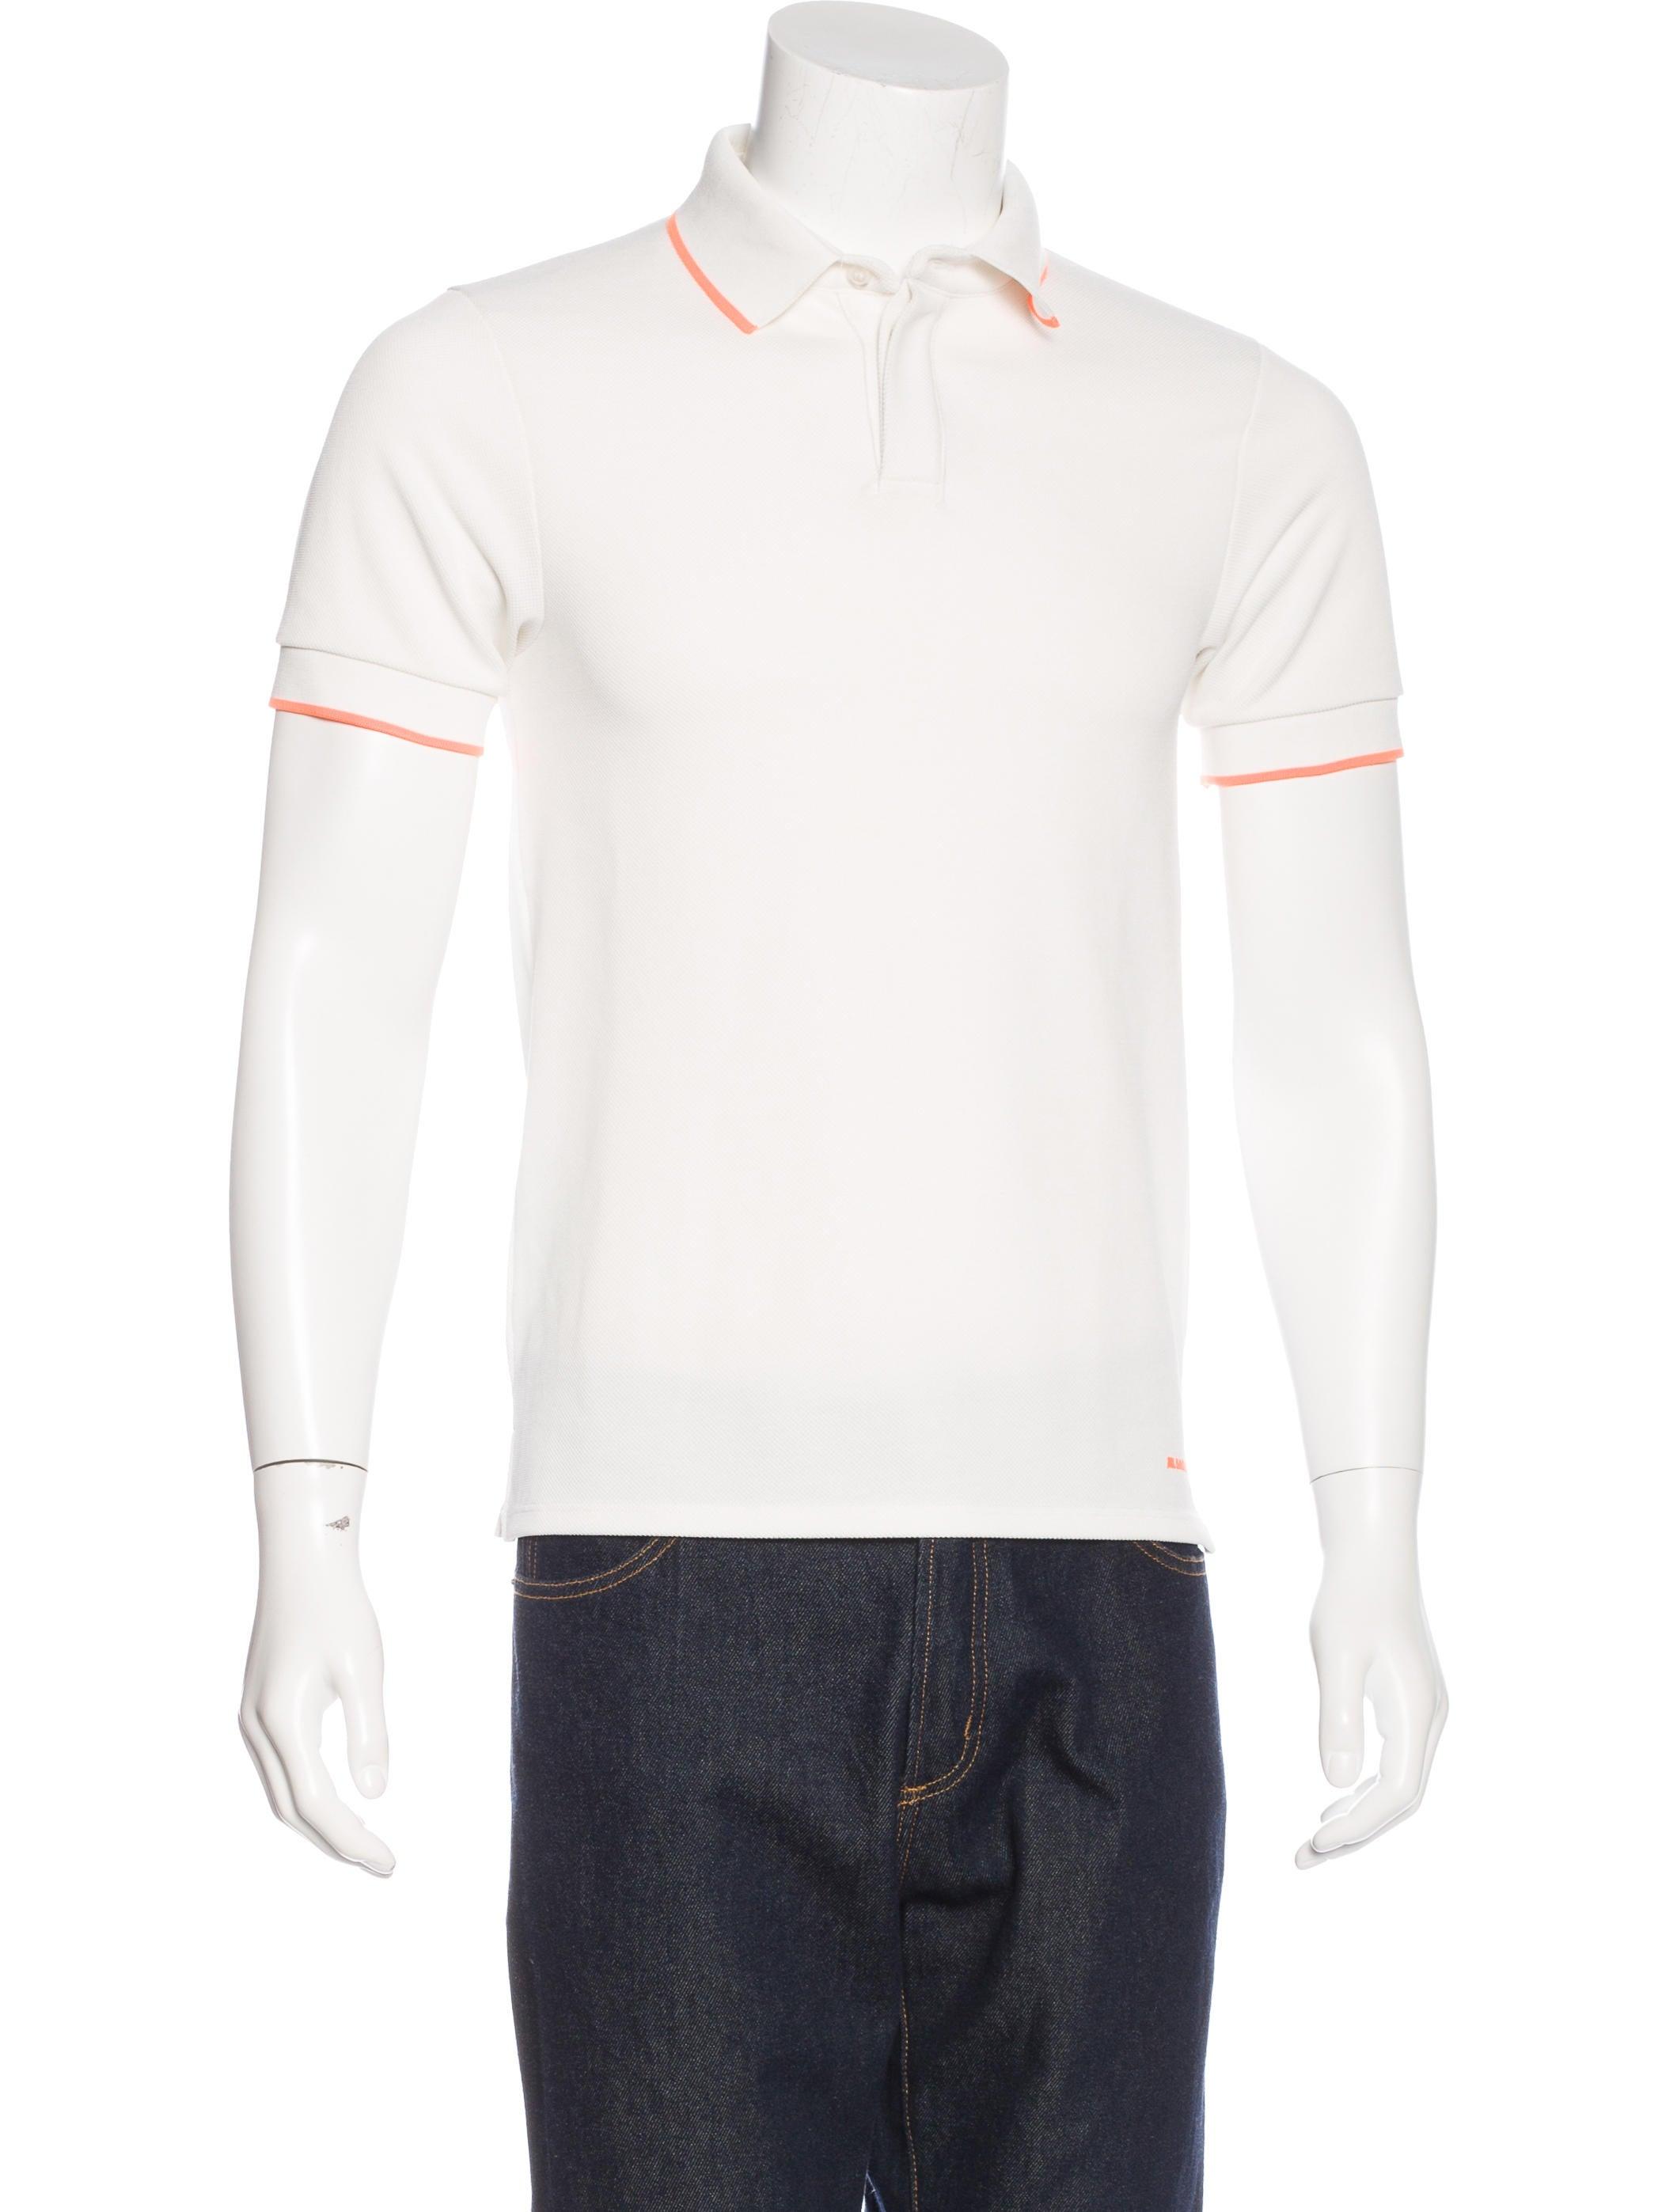 Jil sander piqu polo shirt clothing jil36888 the for Jil sander mens shirt